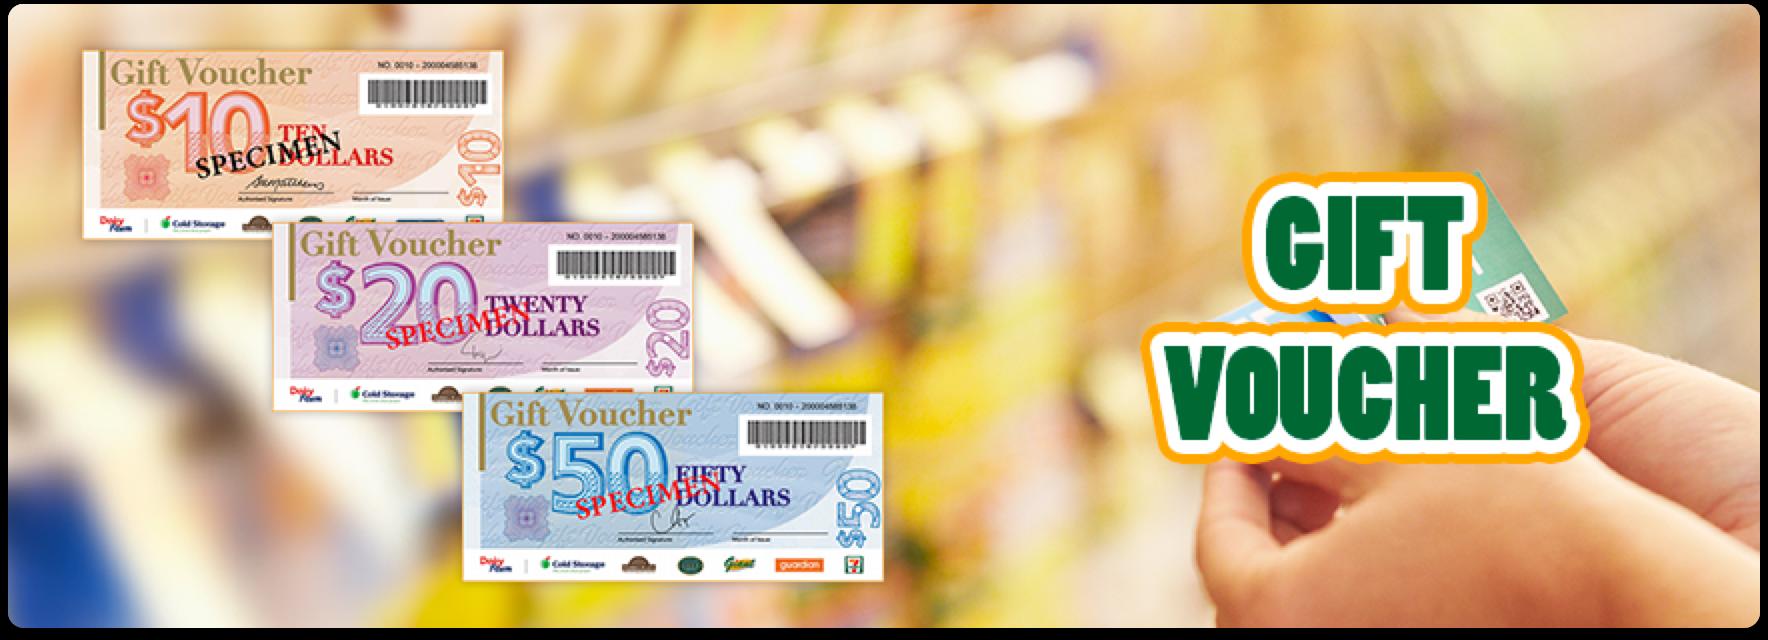 Gift Vouchers - Giant Singapore